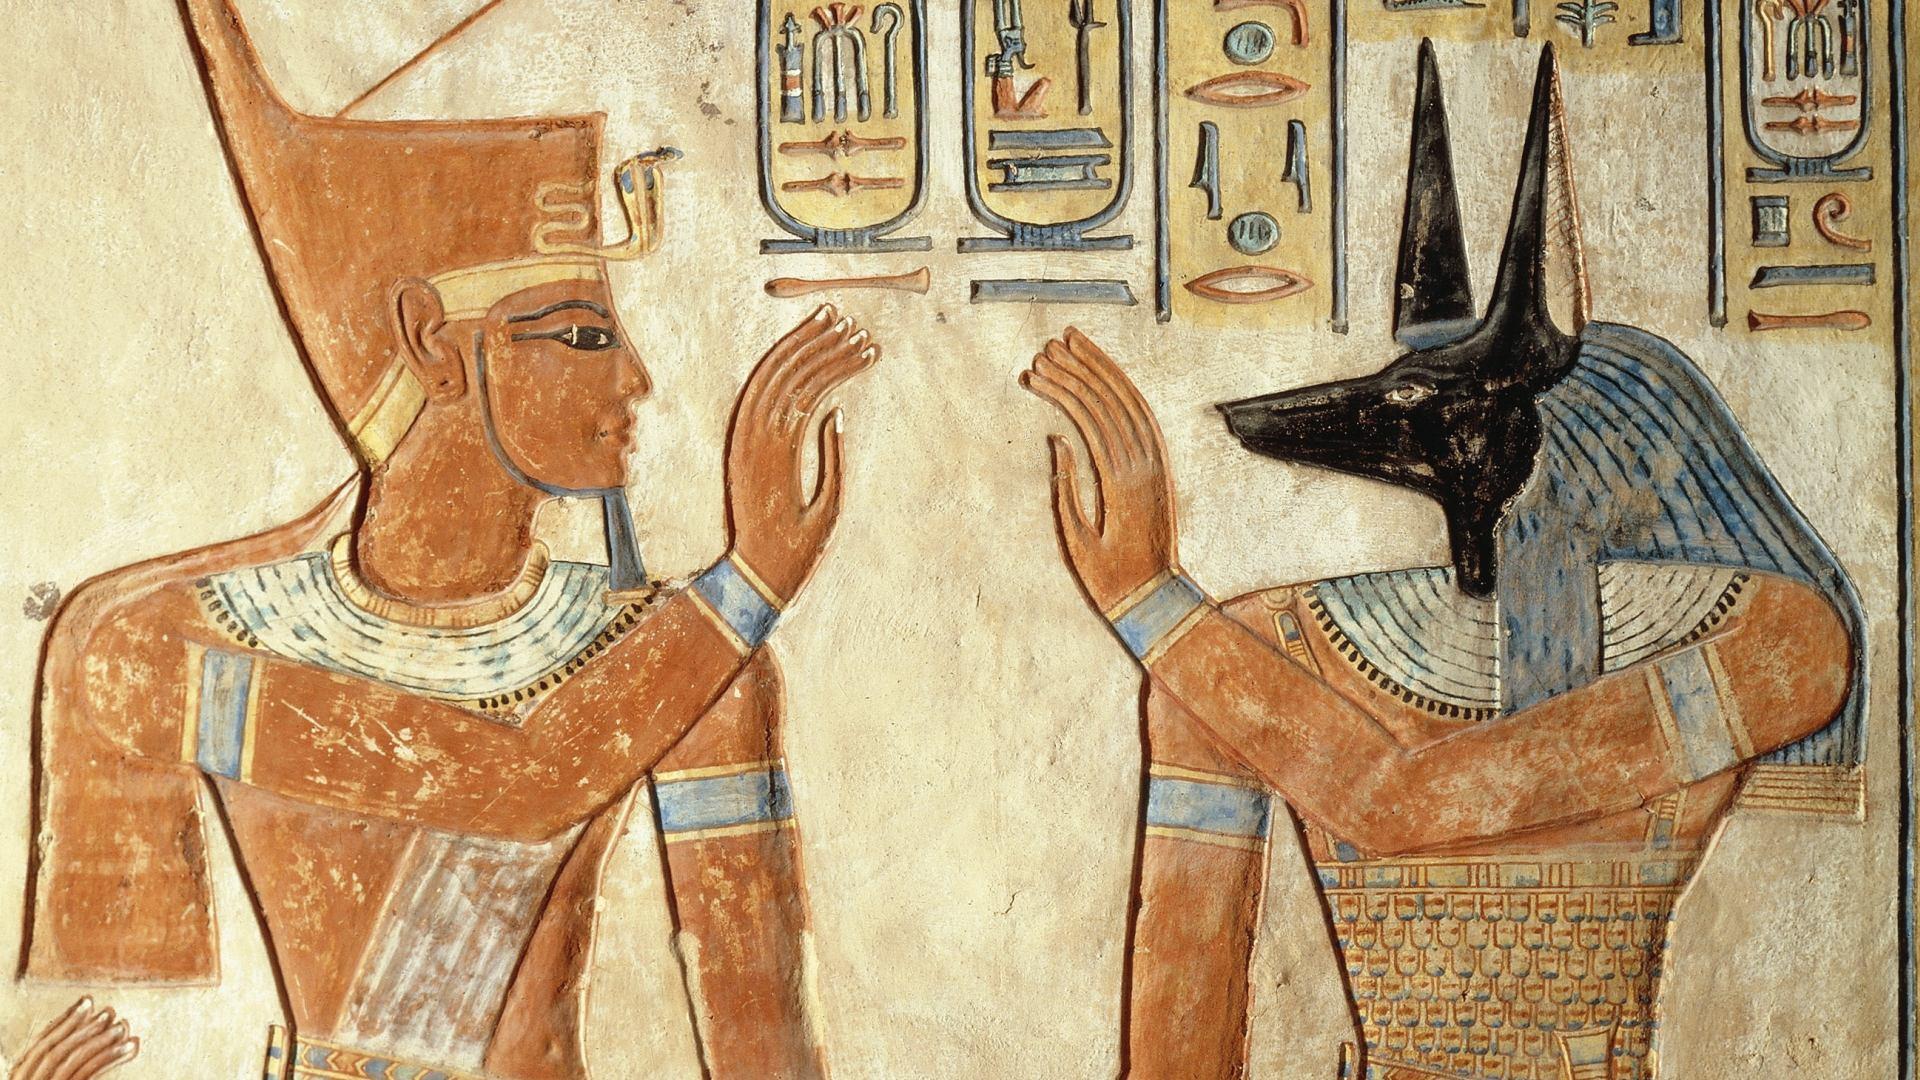 101_ANCIENT_EGYPT_ESSubs_____es_mux__1